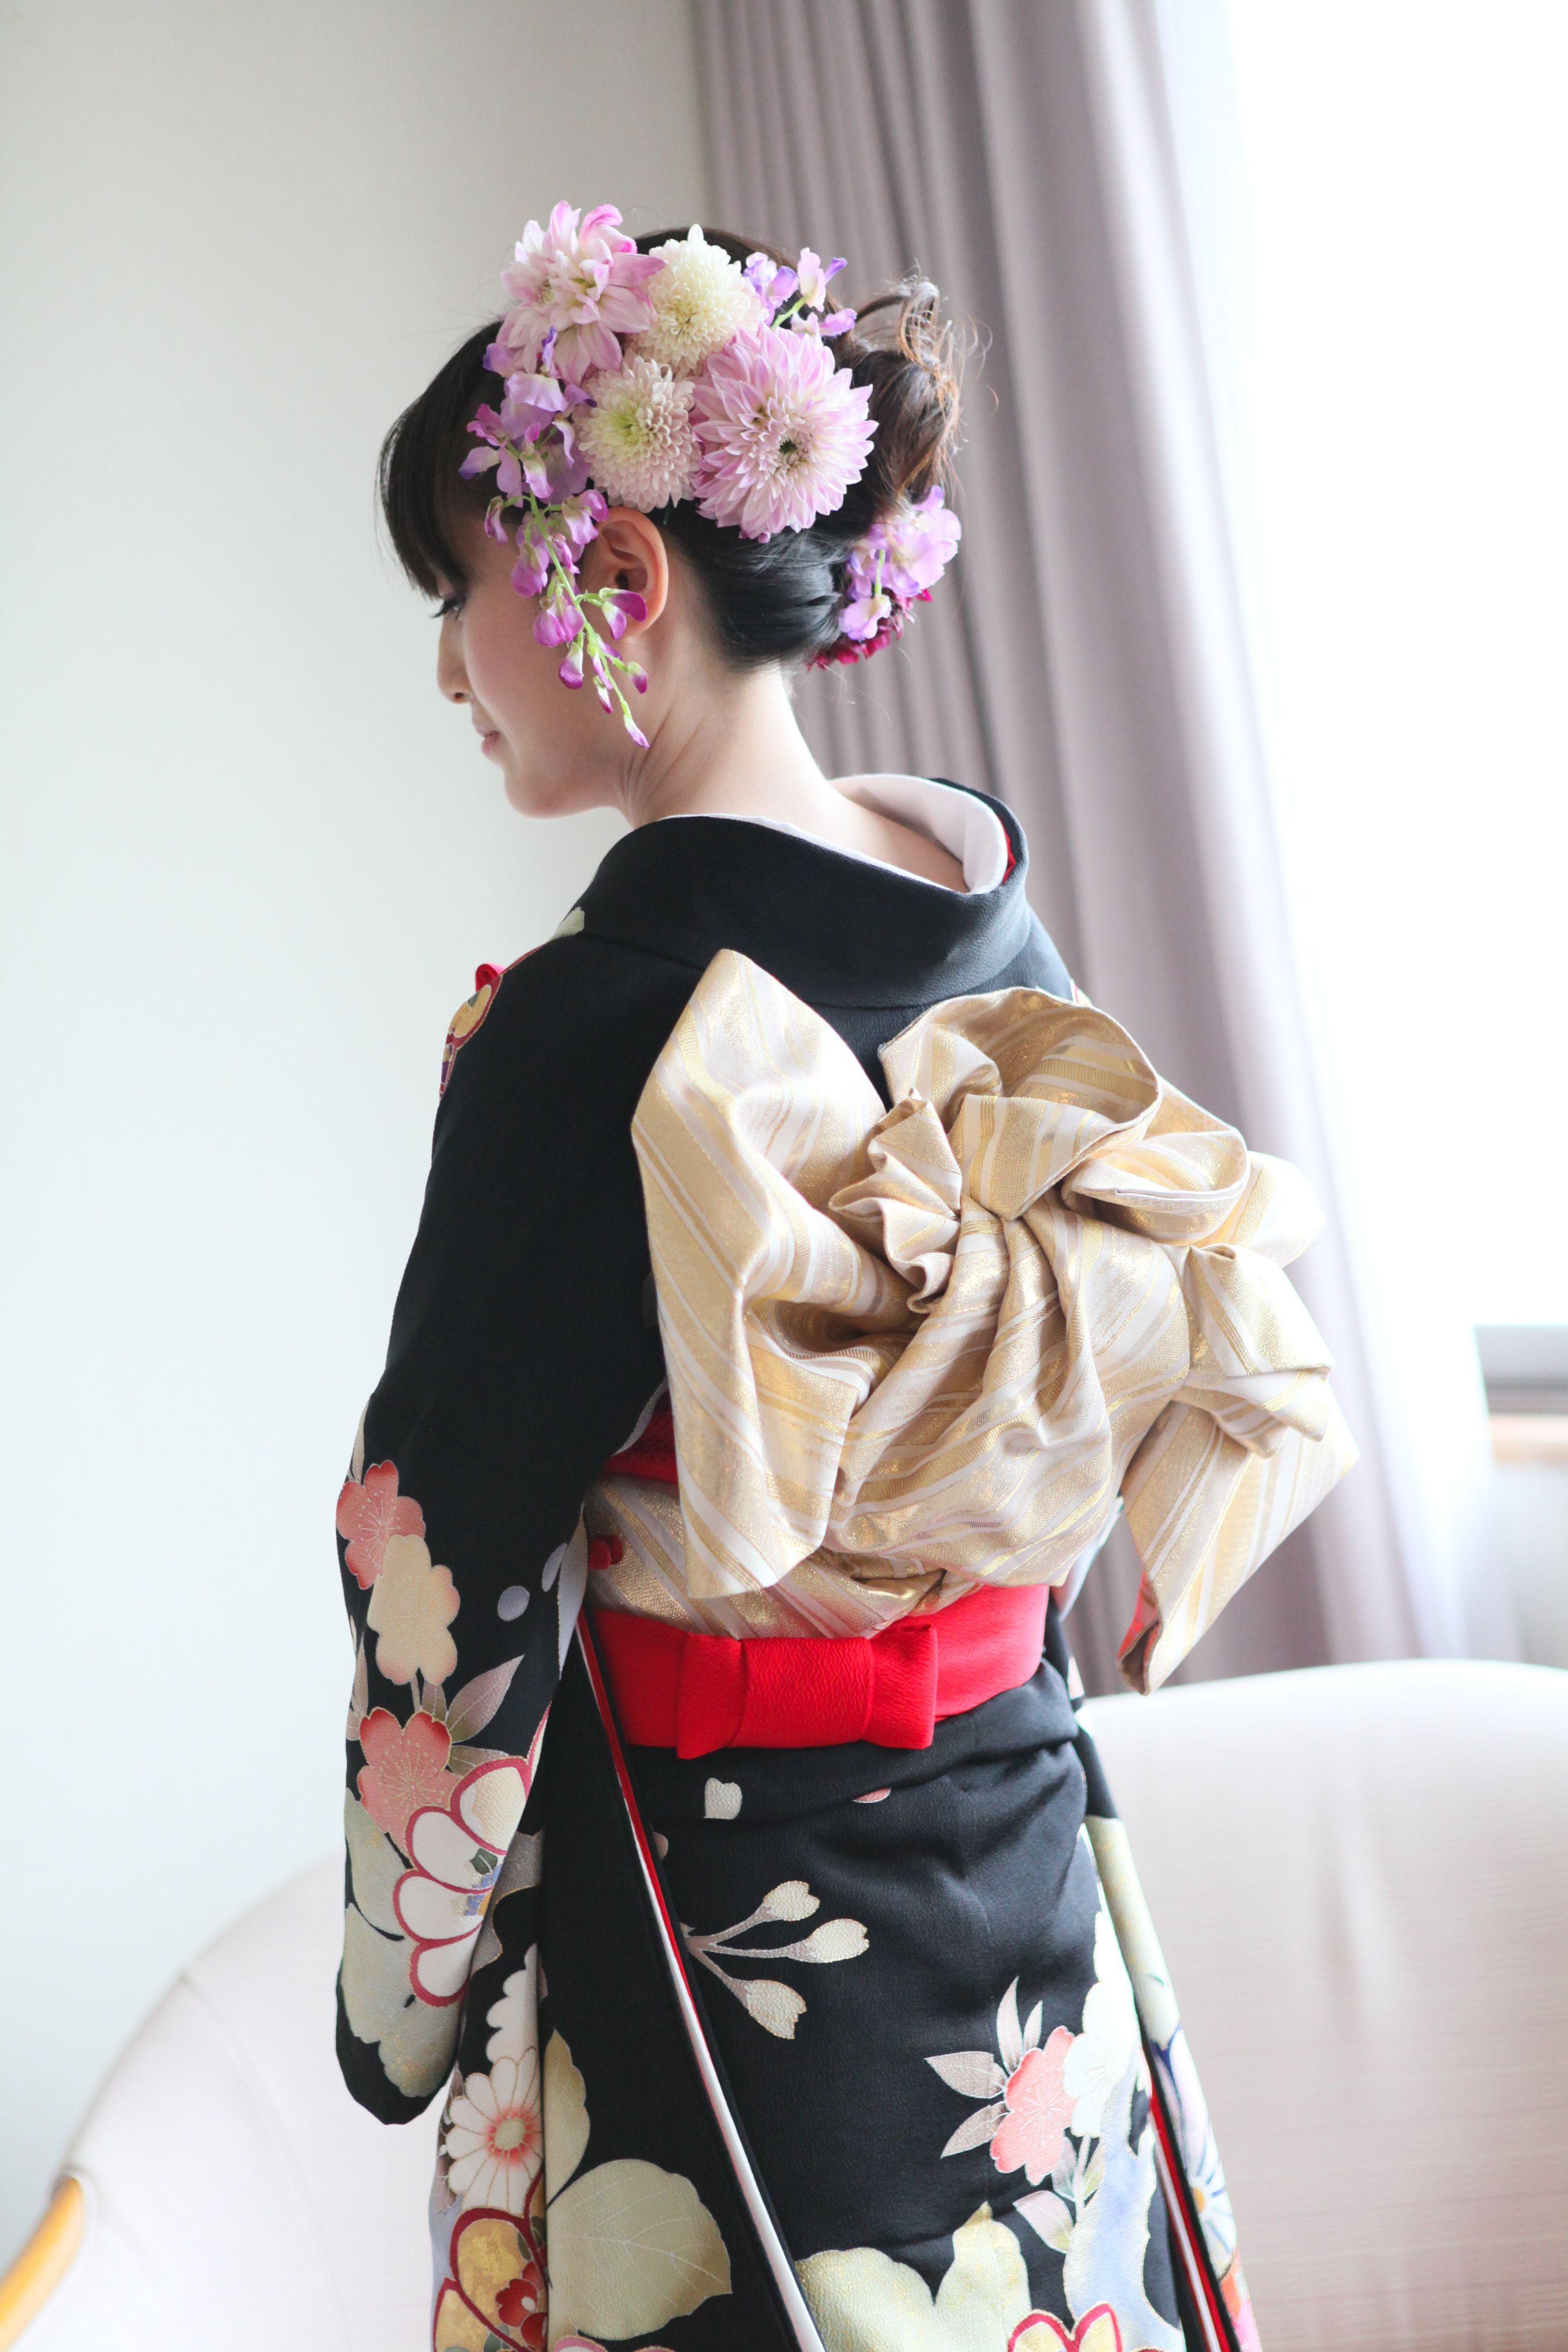 Japanese wedding - Gorgeous flowers on hair | Japanese ...